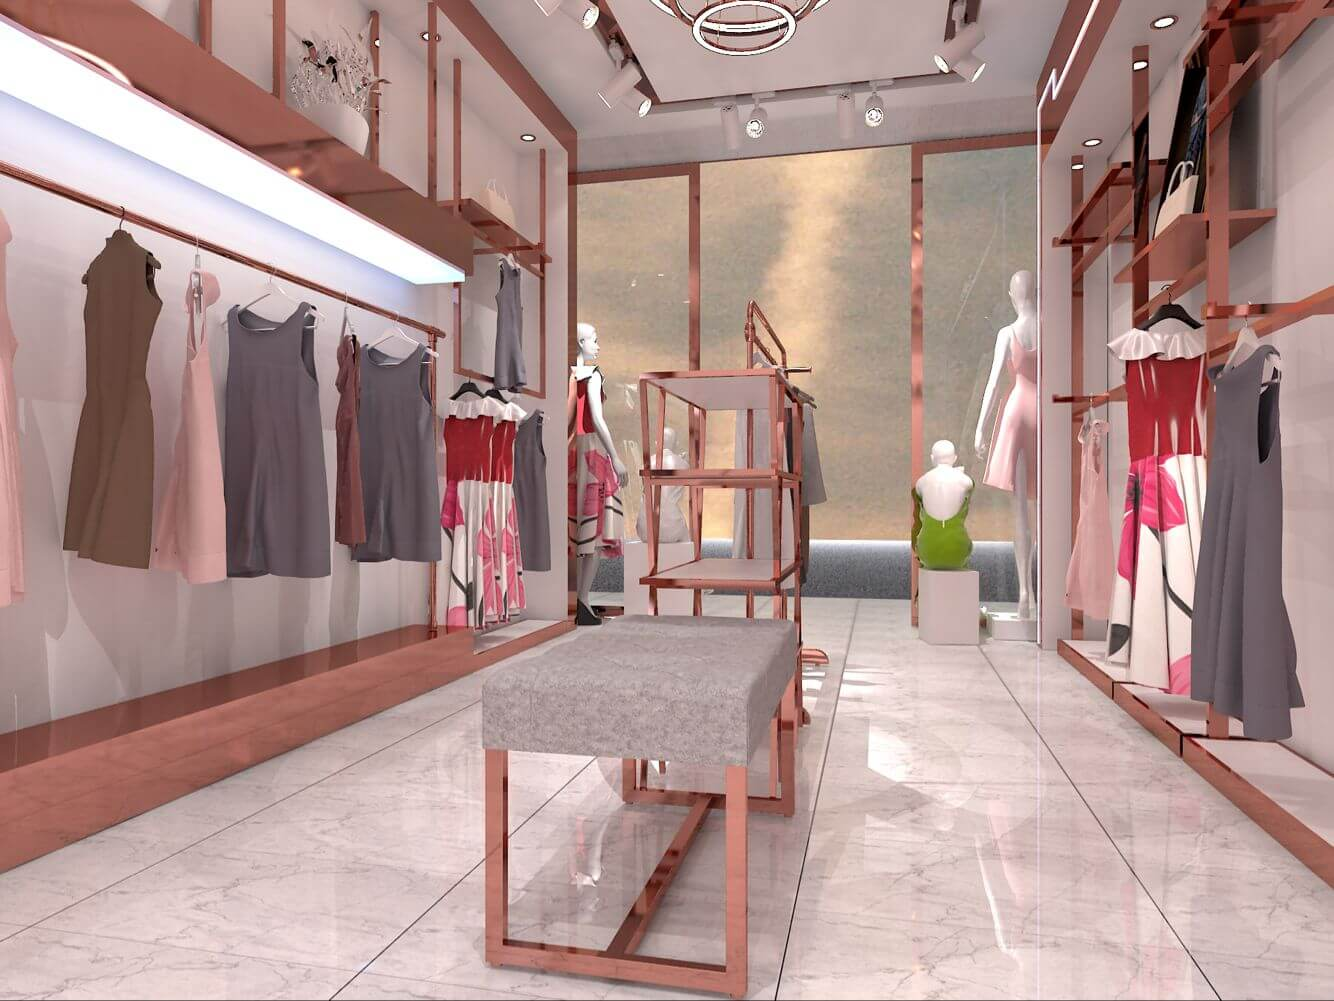 Clothing display racks